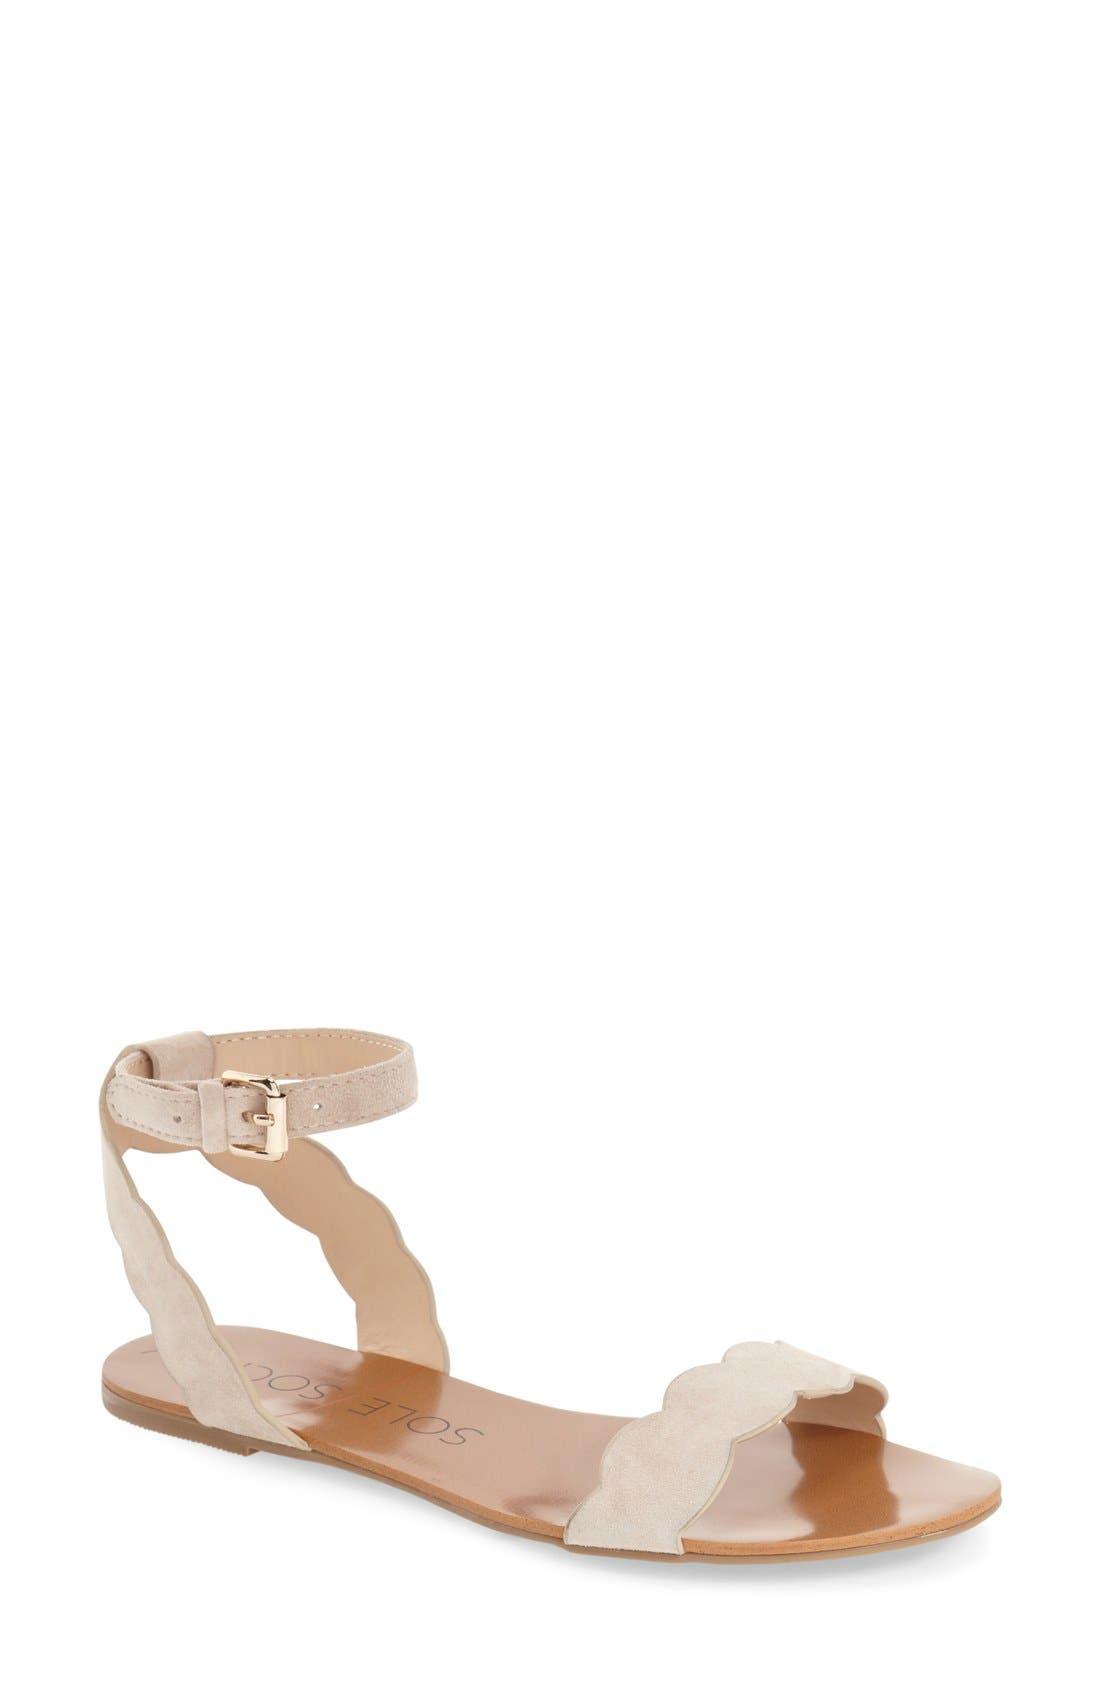 'Odette' Scalloped Ankle Strap Flat Sandal,                             Main thumbnail 5, color,